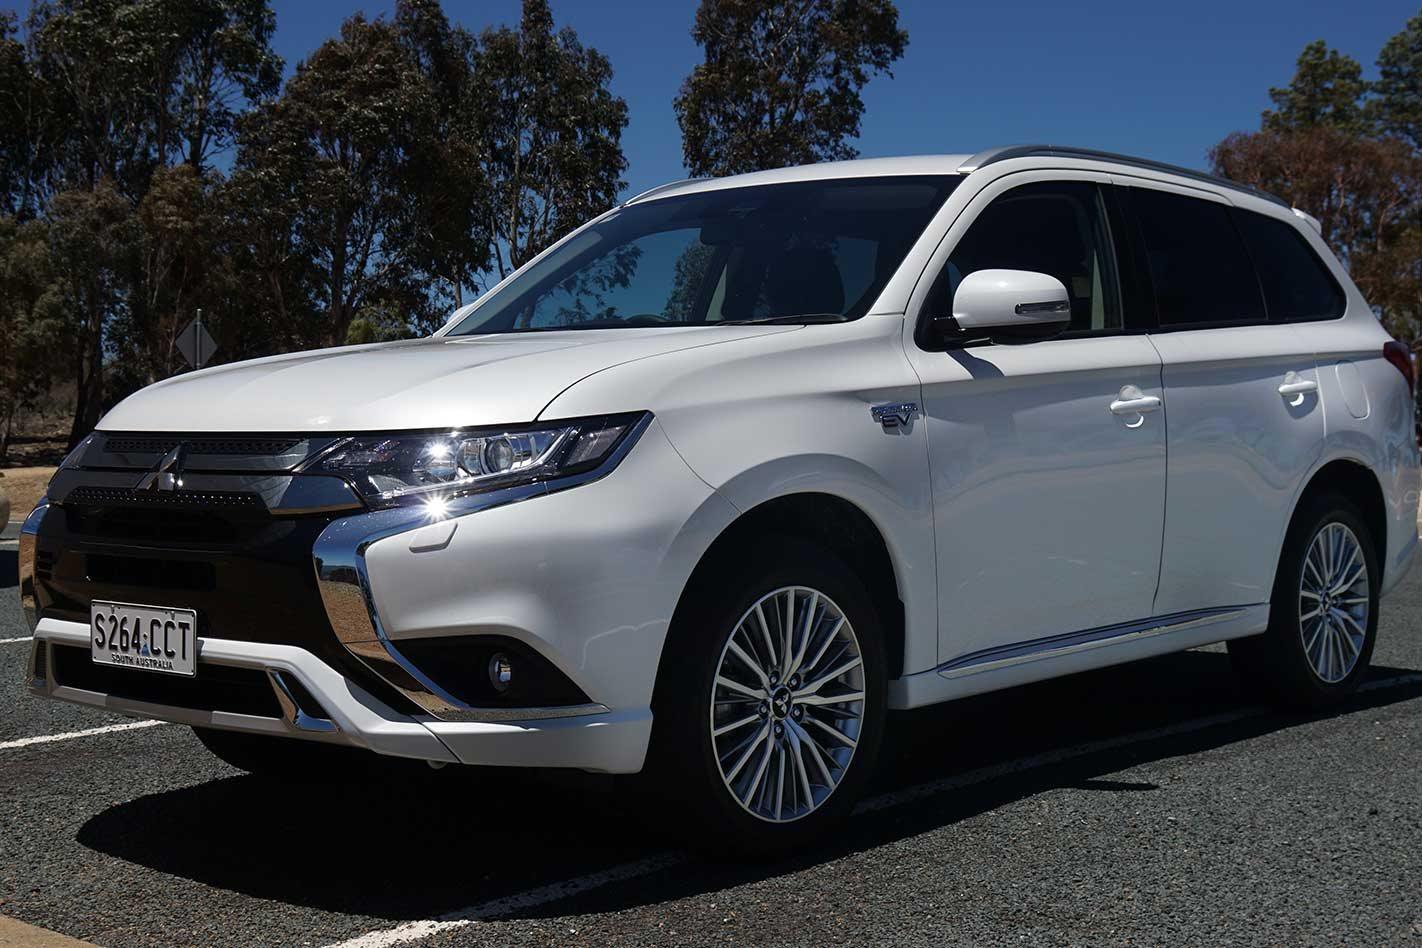 Mitsubishi Outlander PHEV gets a bigger engine with 2020 update